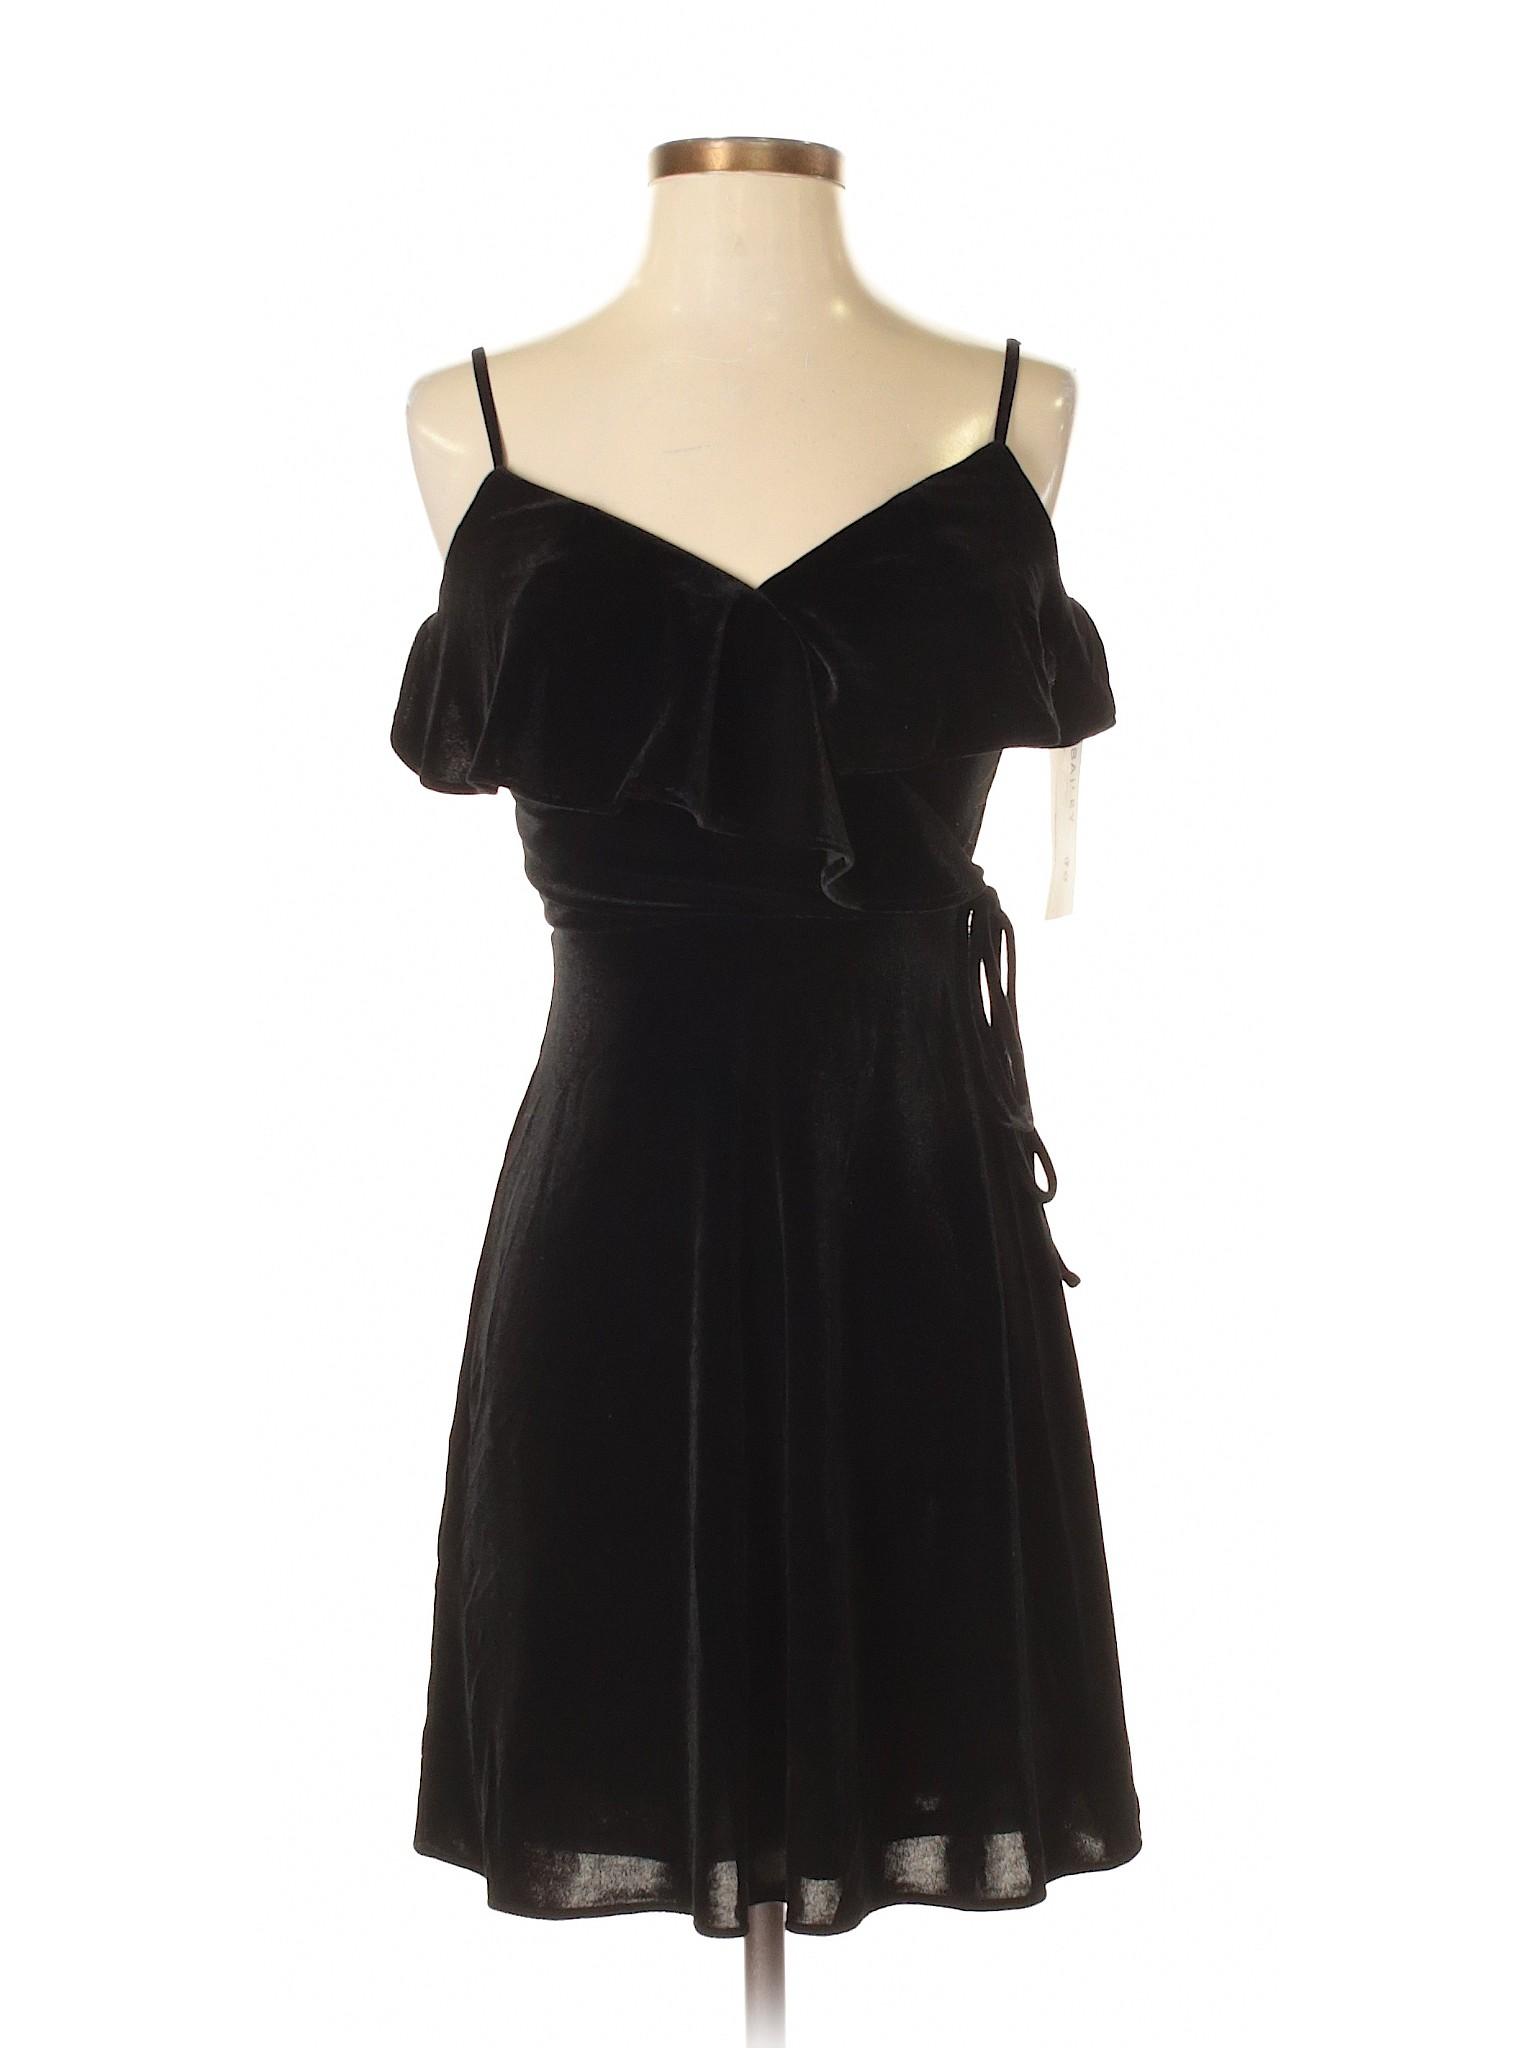 44 Bailey Casual winter Dress Boutique 7vqYwEz